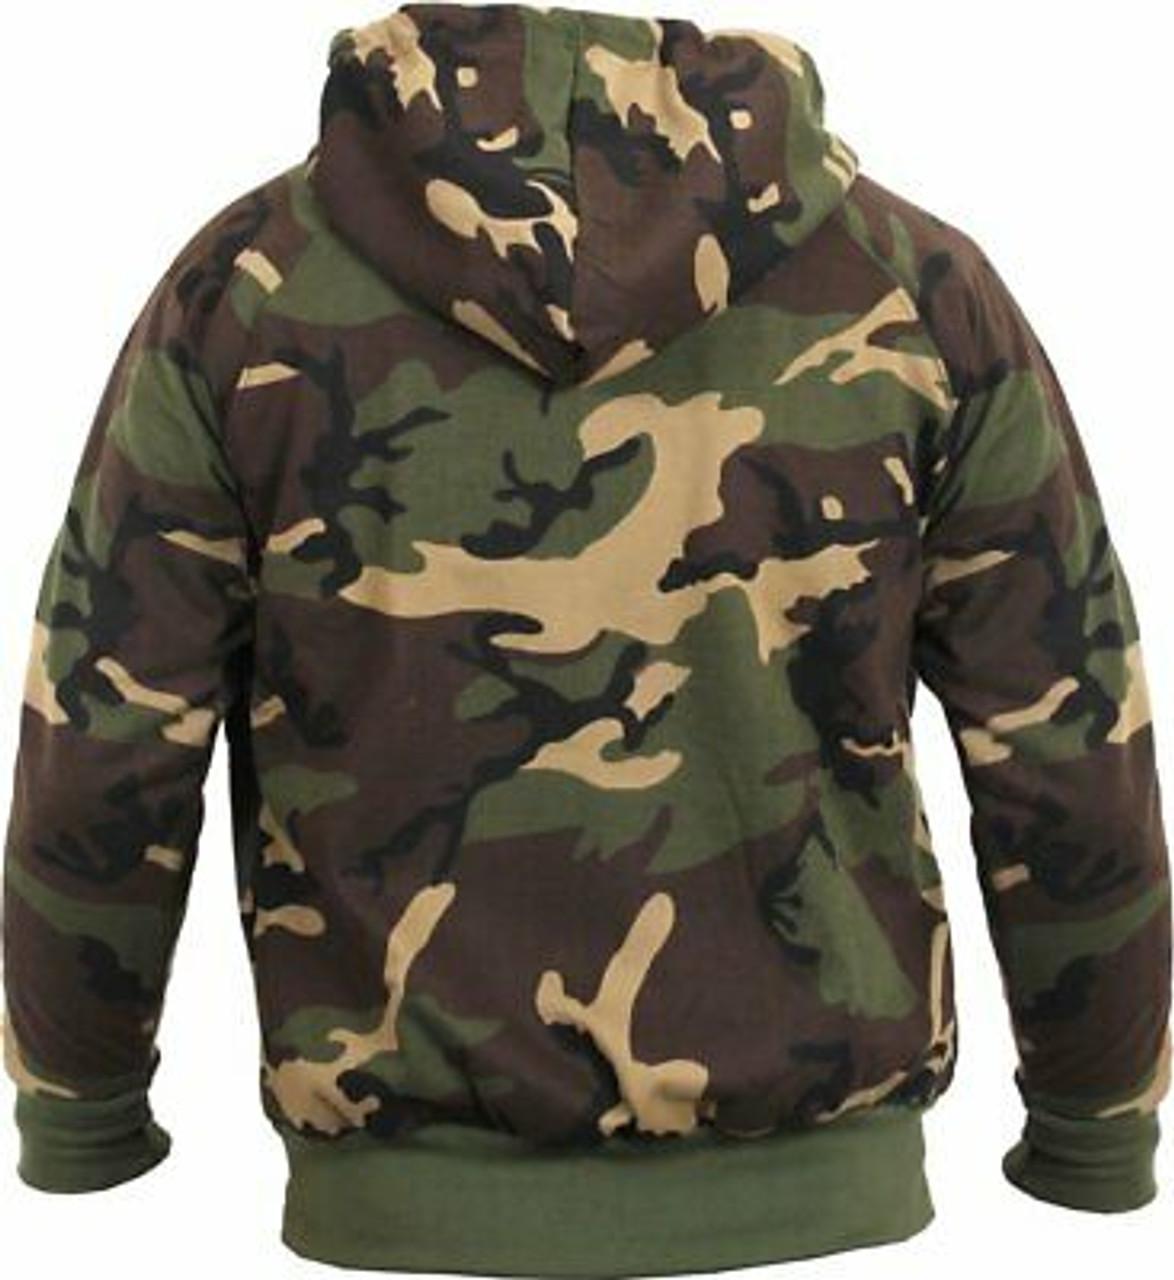 Woodland Camouflage Kids Hooded Sweatshirt Camo Hoodie Rothco 6490